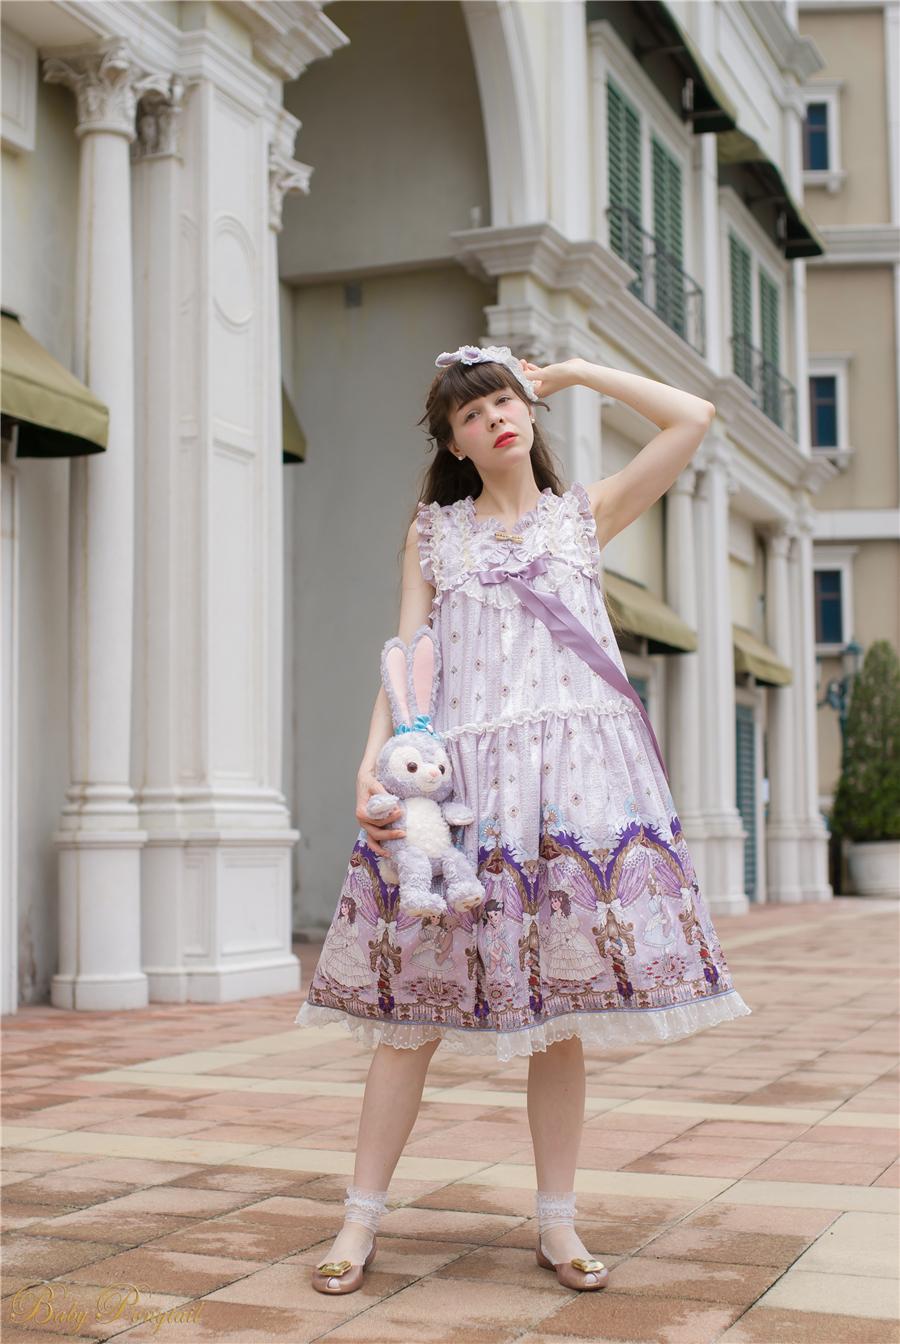 BabyPonytail_Model Preview_My Favorite Companion_Purple JSK_NG-3_Claudia_03.jpg